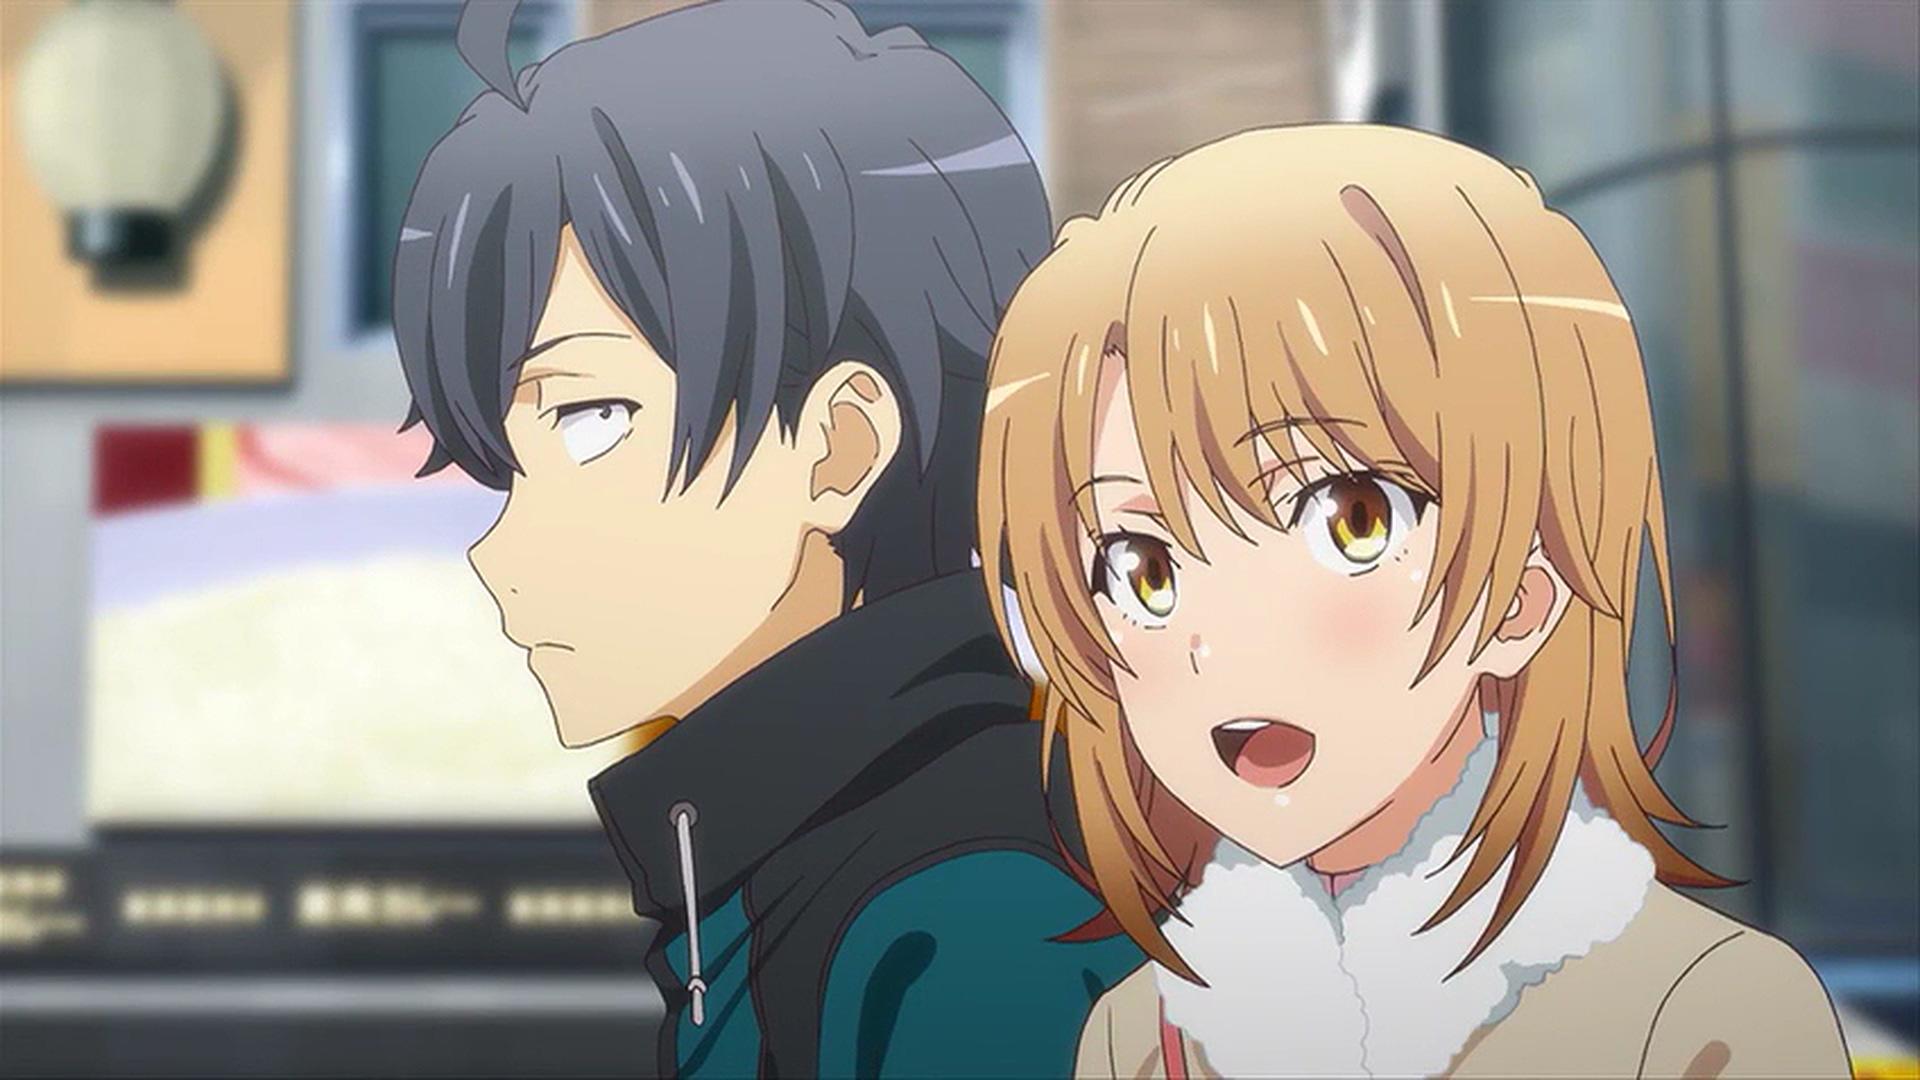 Oregairu.Zoku ( Season 2 ) OVA | Anime Kovers